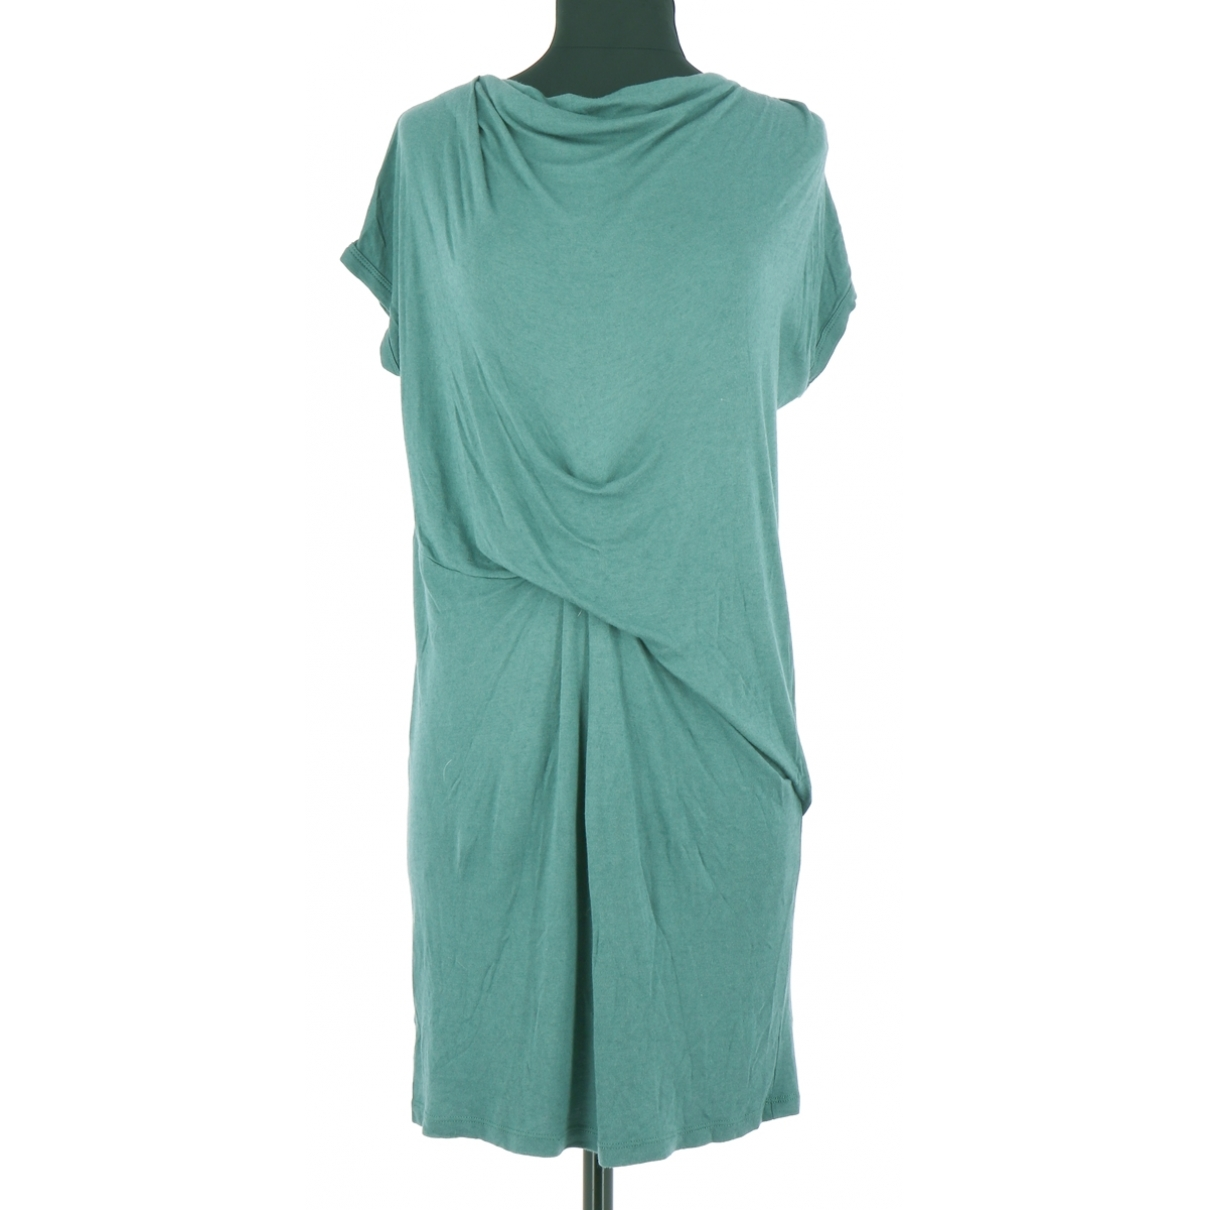 American Vintage - Robe   pour femme en coton - bleu